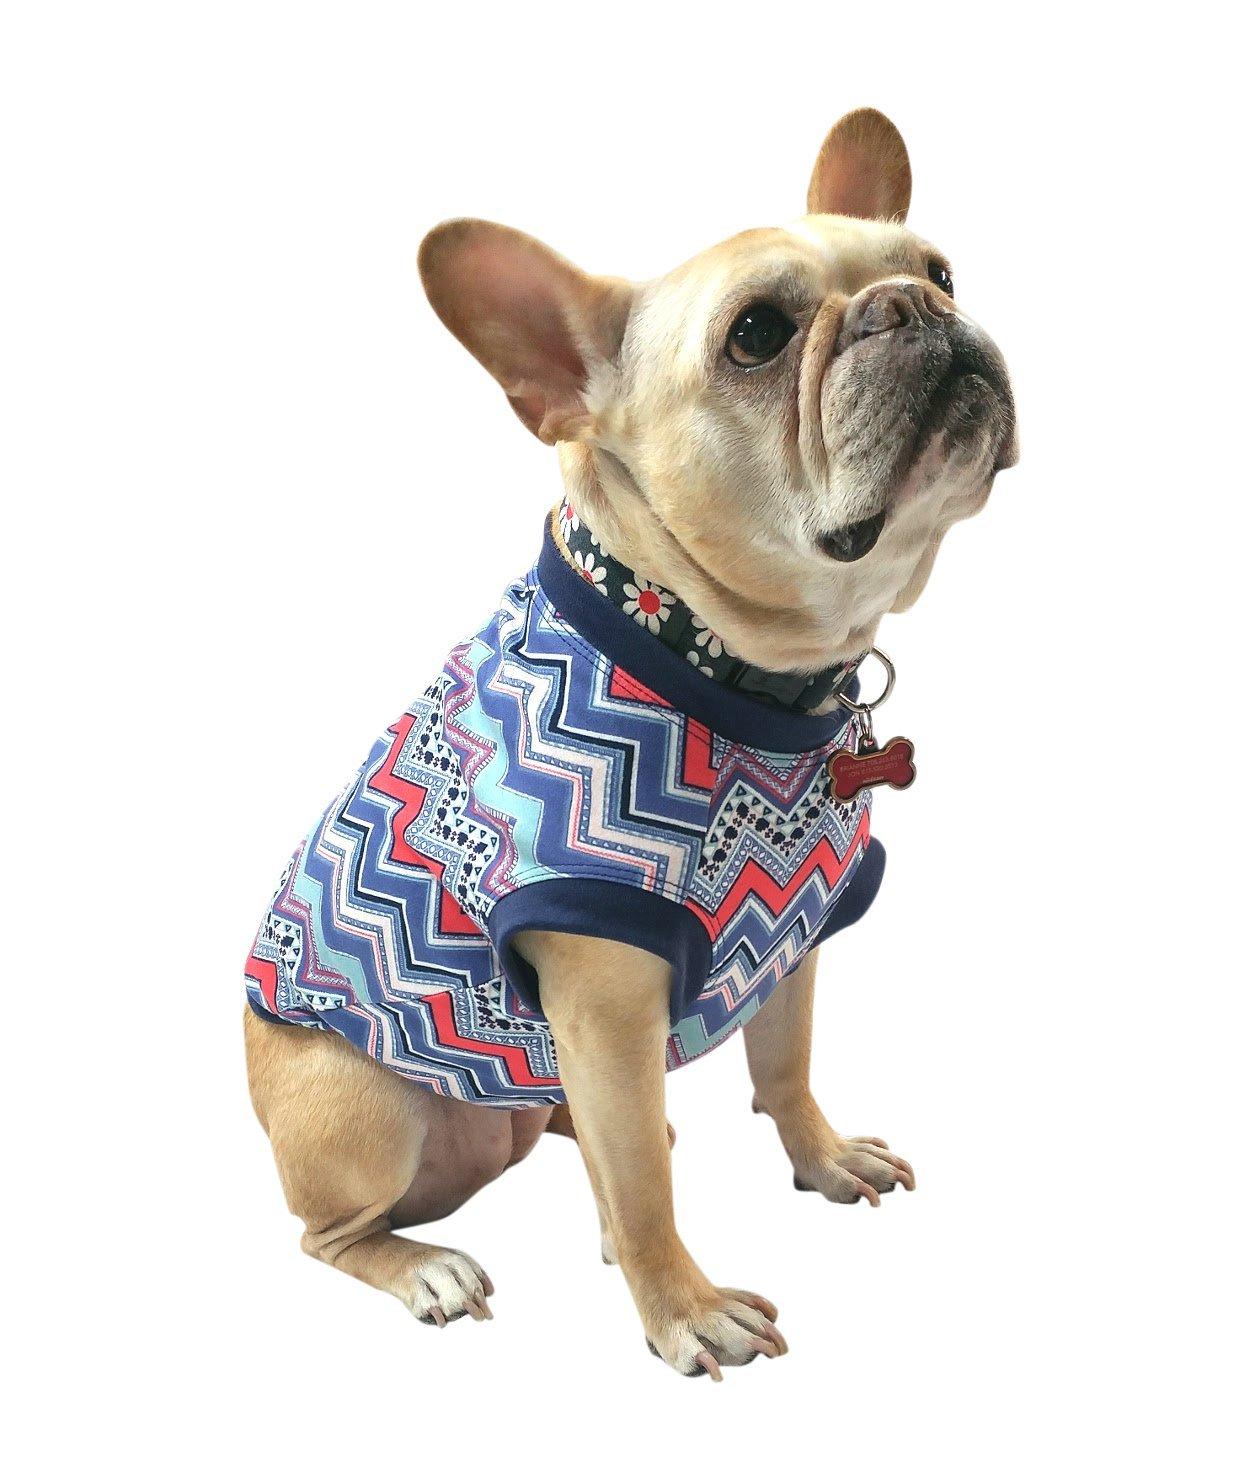 Pink and Phoenix Minneapolis Mall Mall Blue Chevron Girl Dog Bulldogs S Clothing Tshirt French